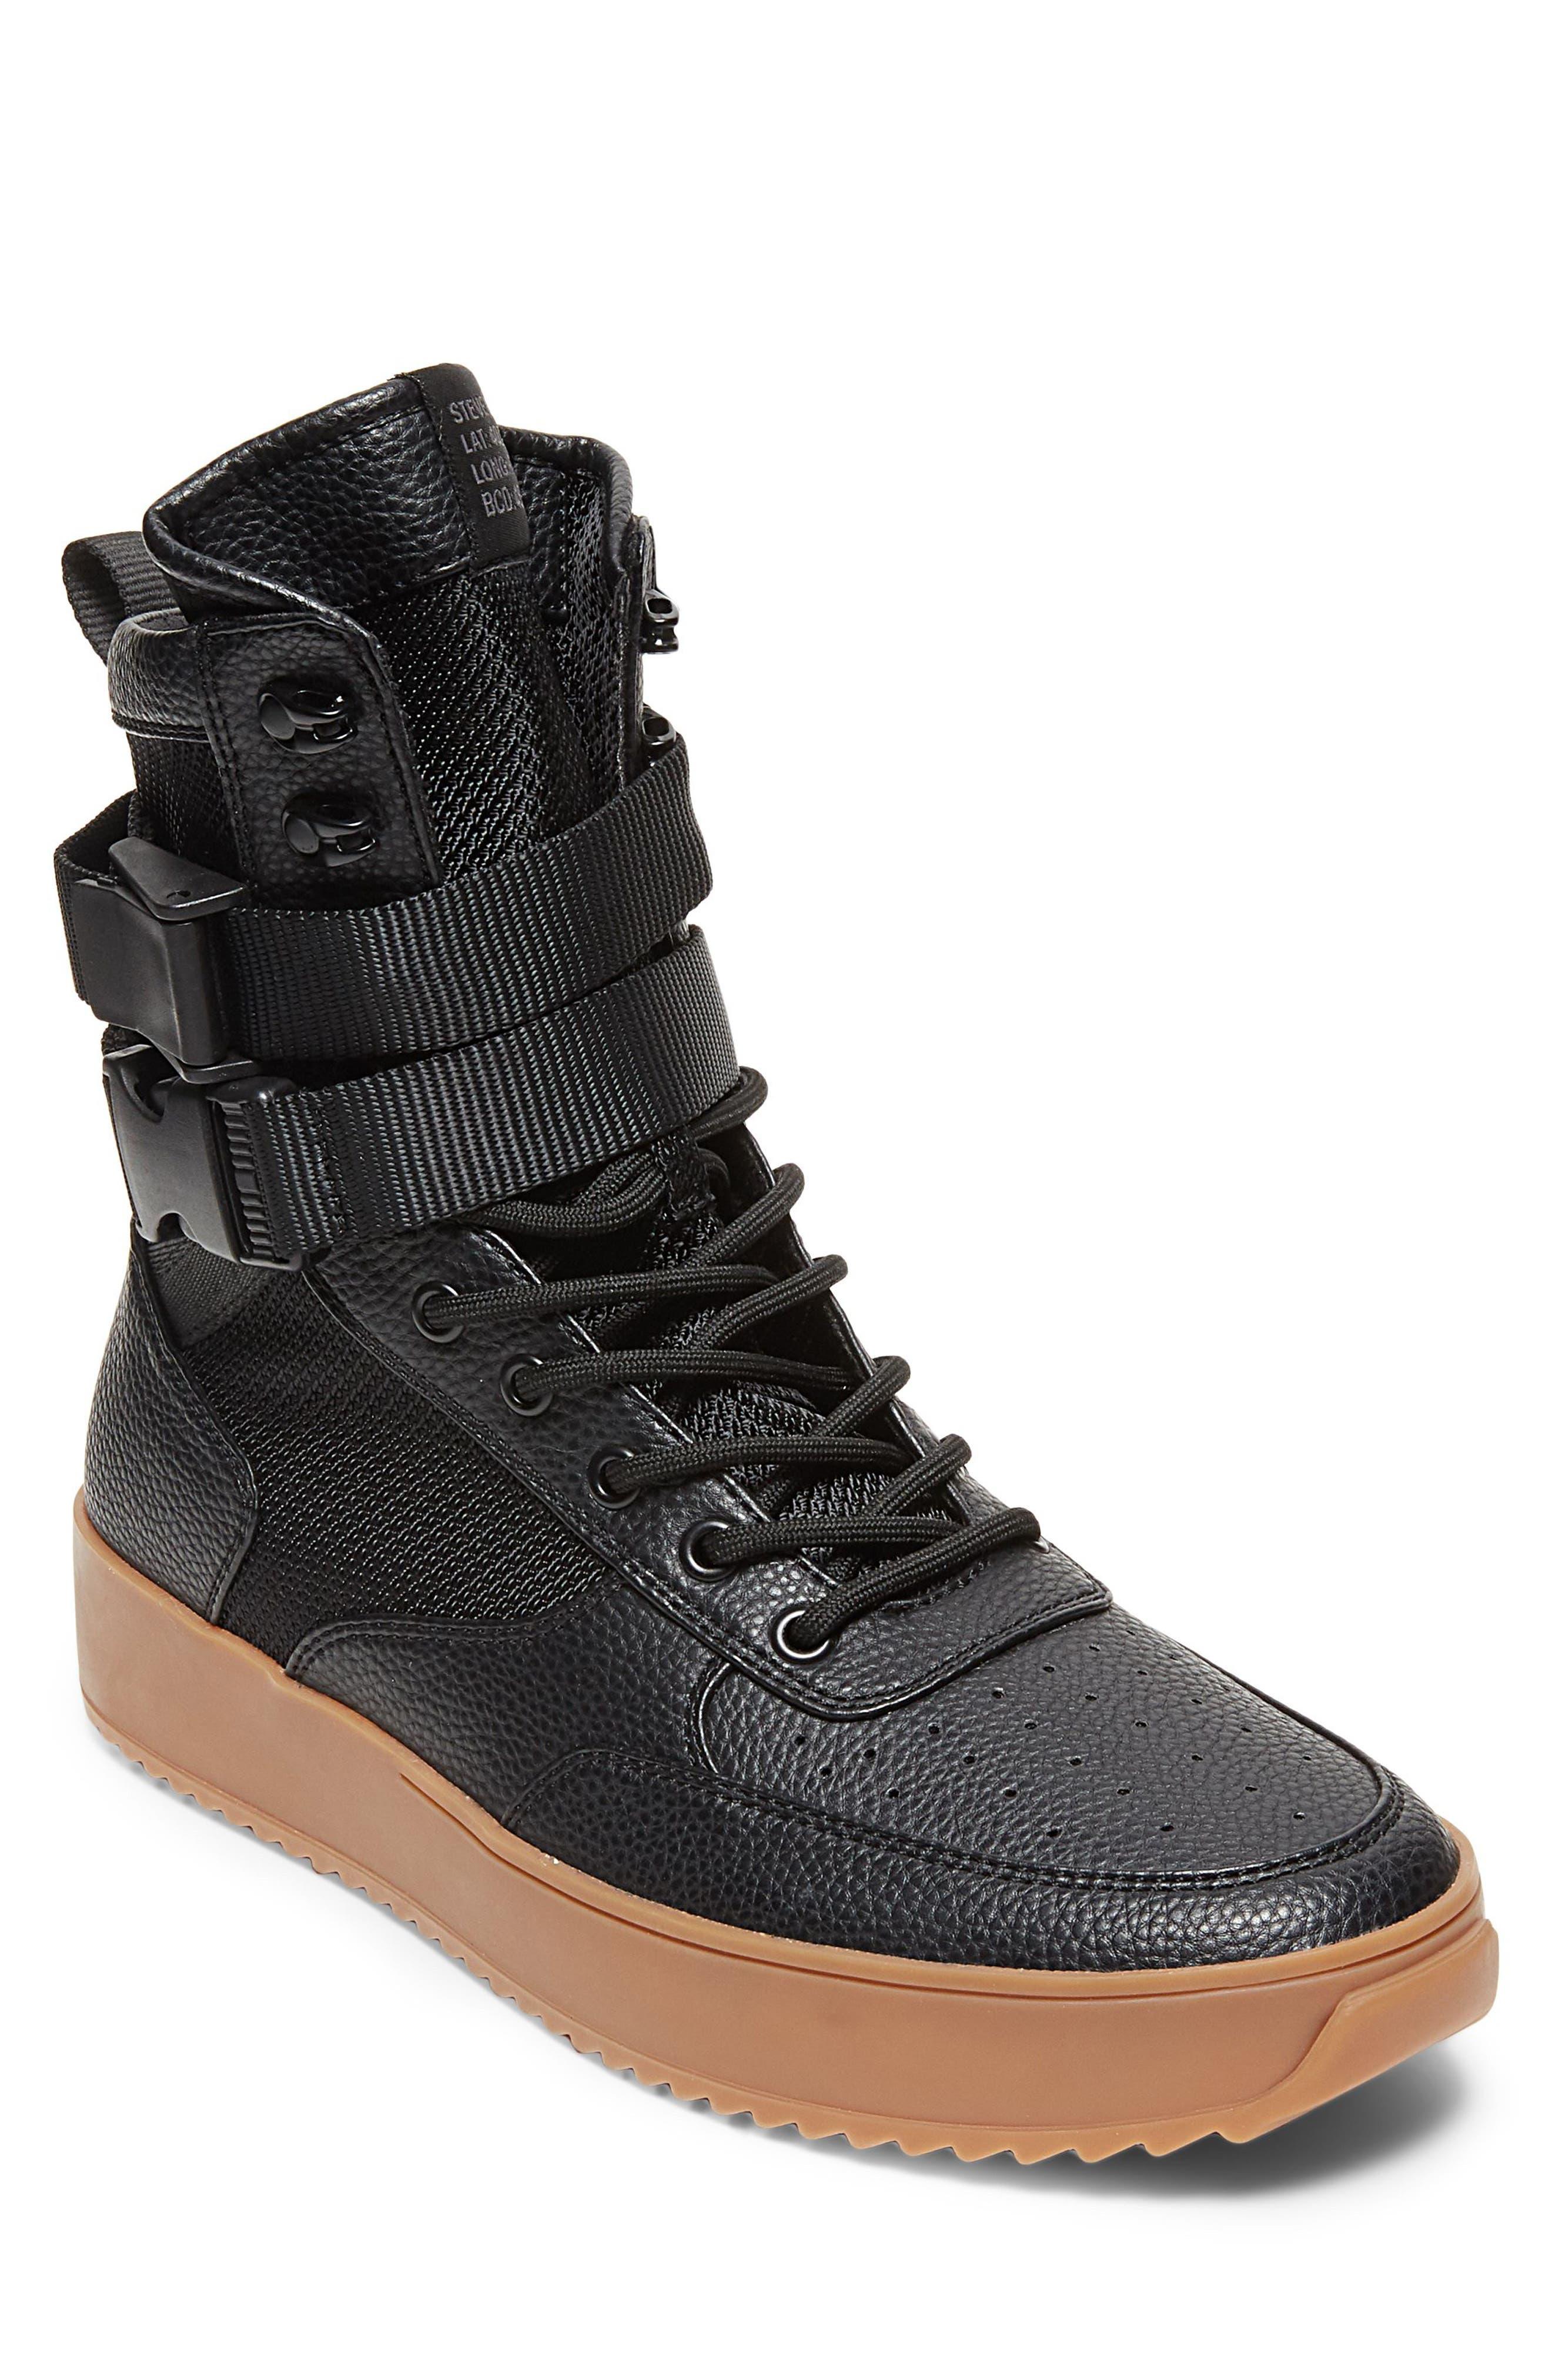 Zeroday Sneaker,                             Main thumbnail 1, color,                             Black